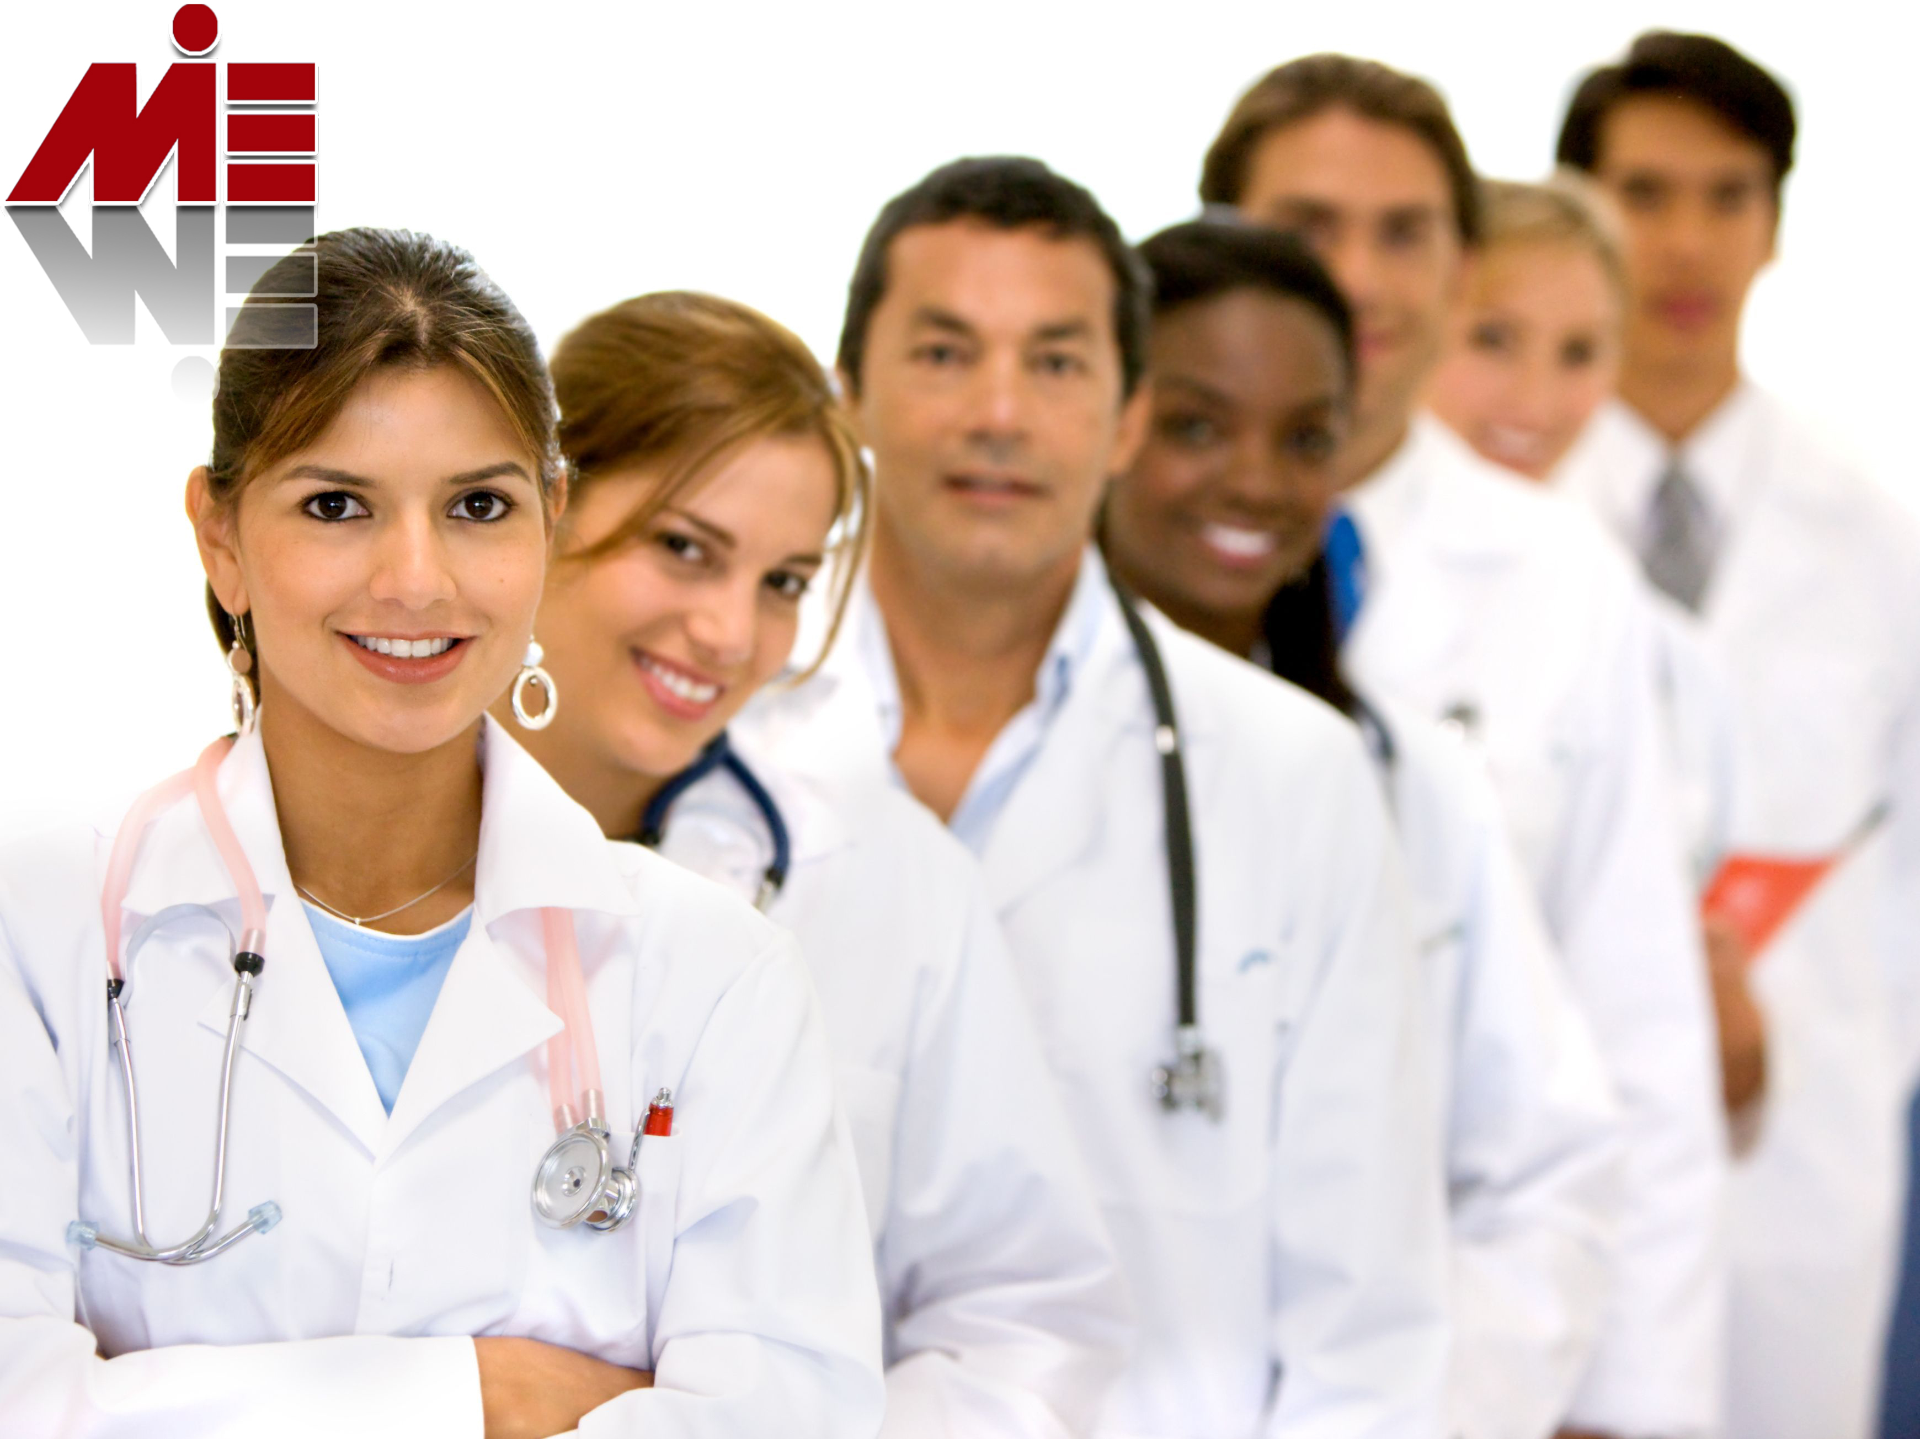 bursaries to study medicine in south africa تحصیل پزشکی در آفریقای جنوبی